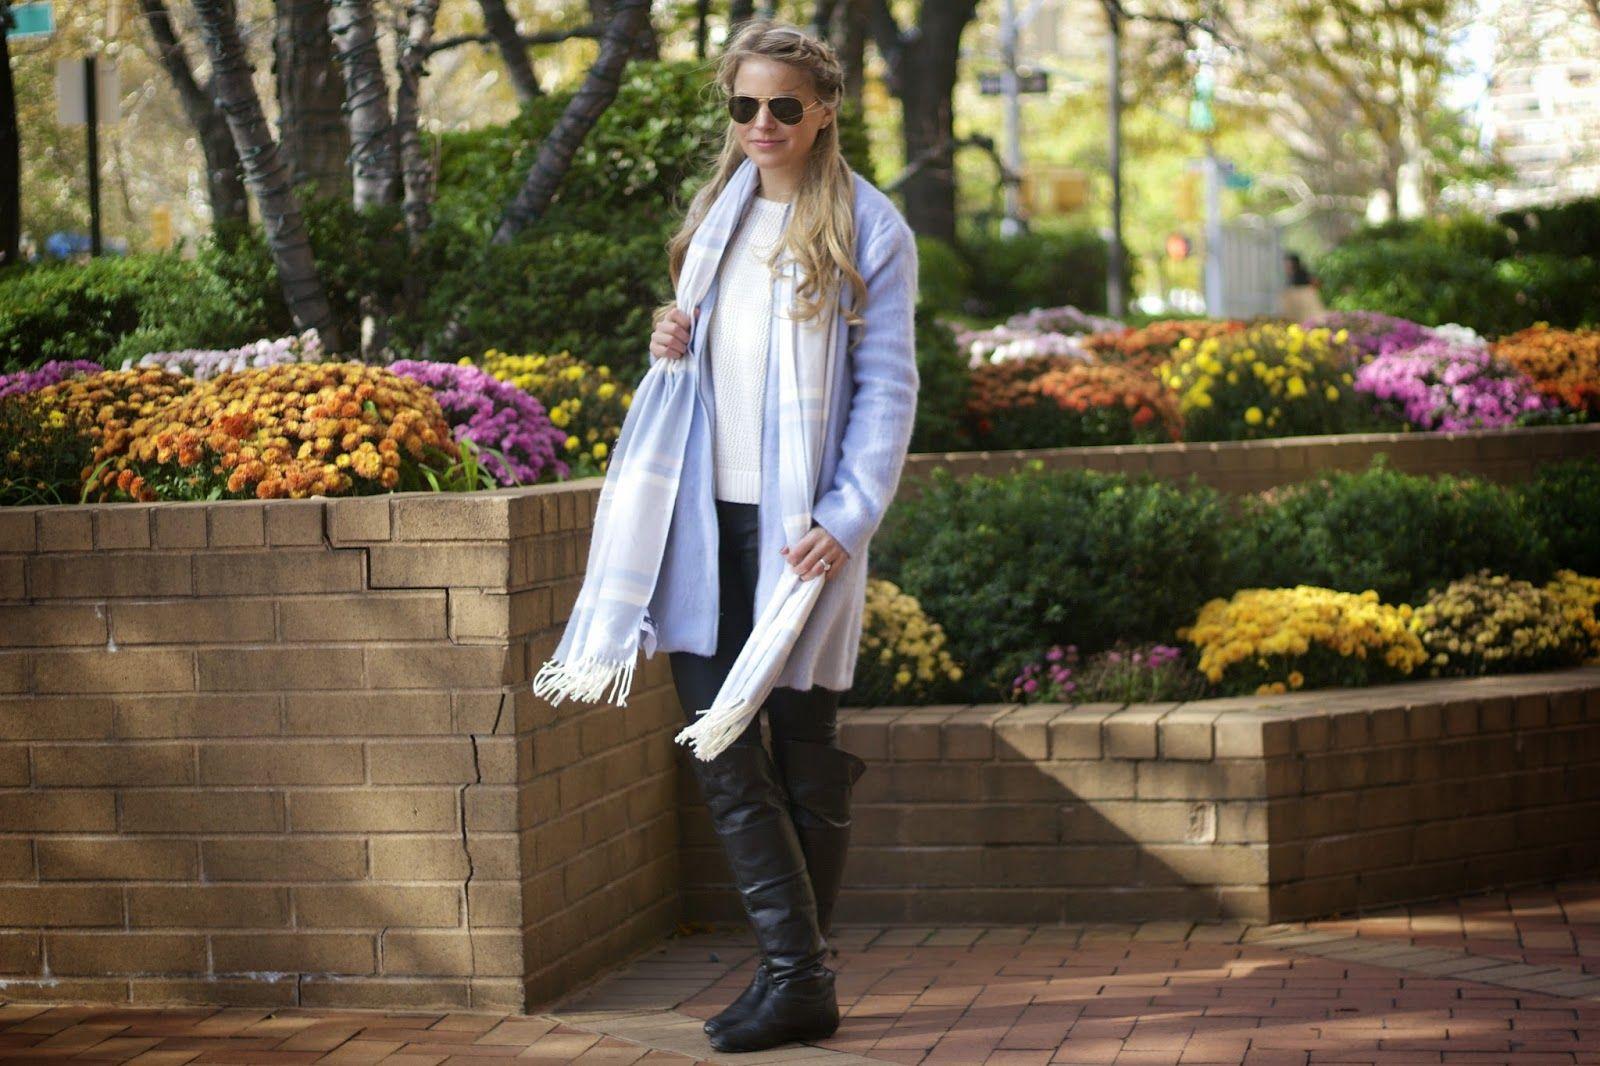 BABY BLUE COAT - Styled Snapshots